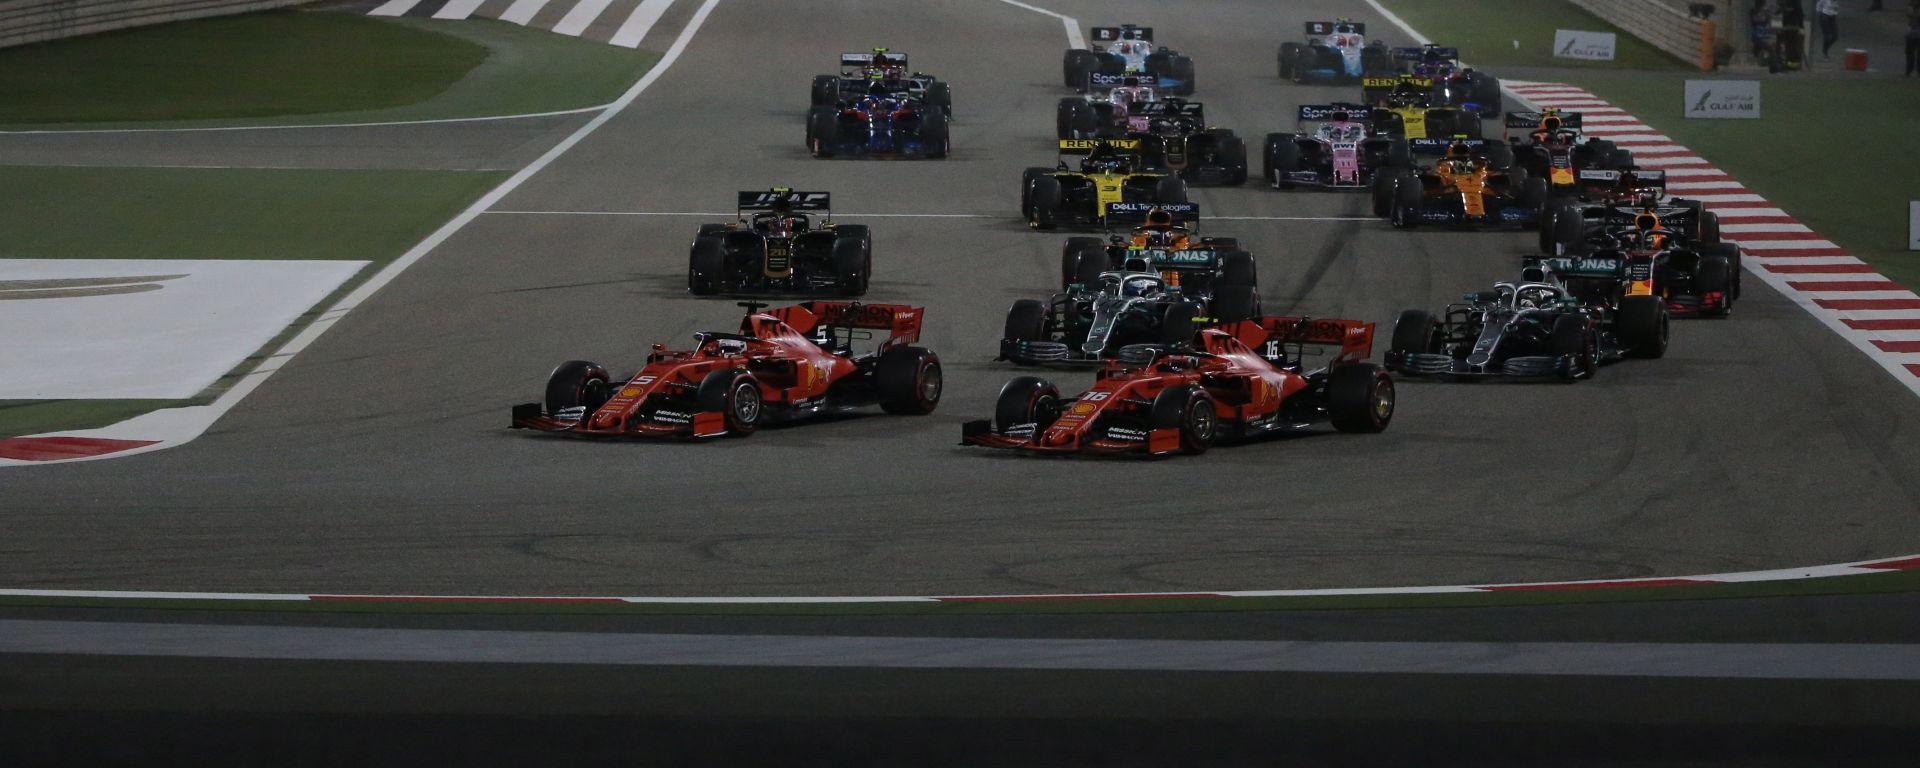 La partenza del Gp Bahrain 2019